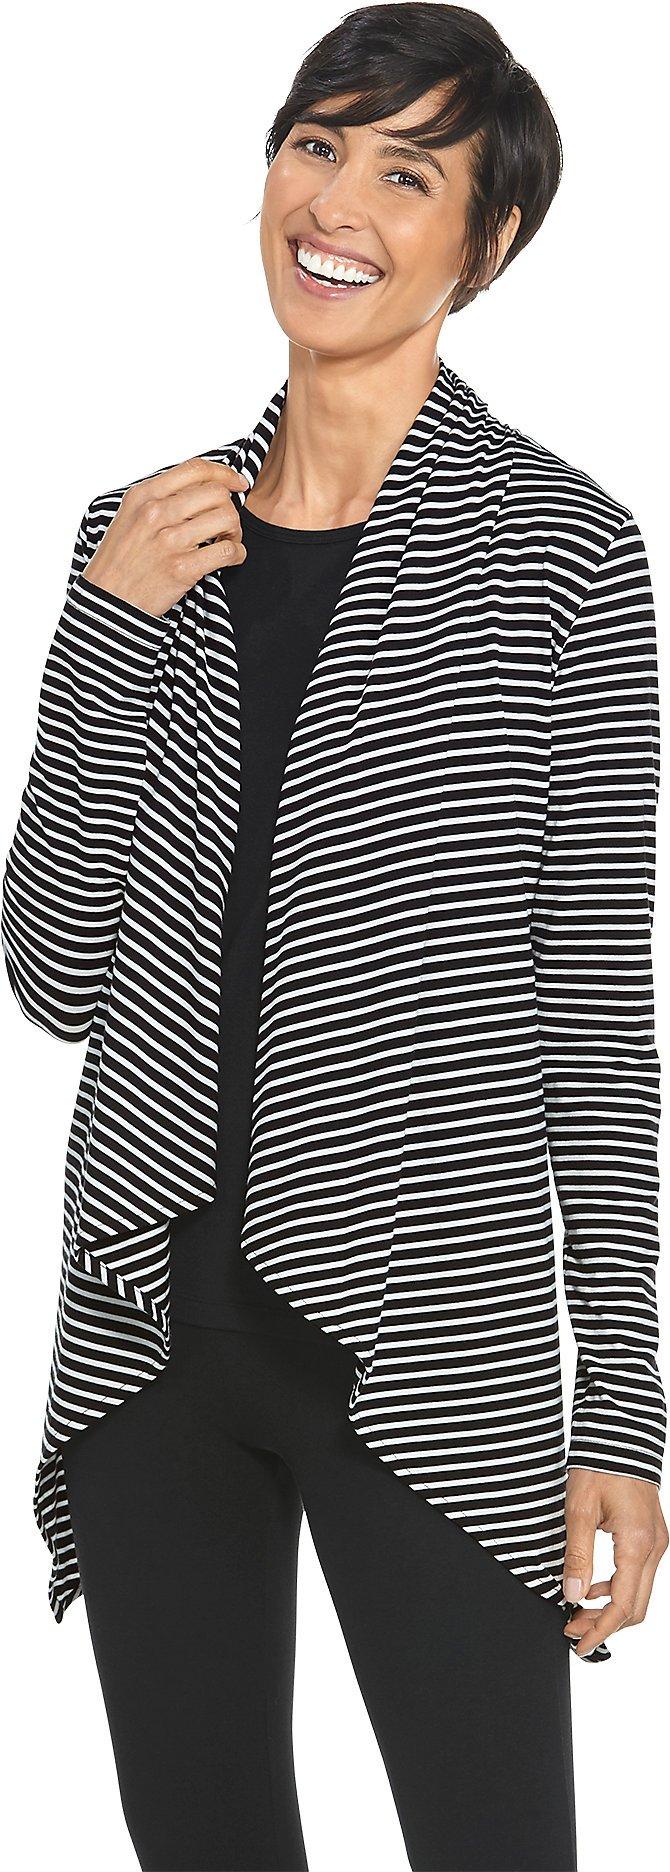 Coolibar UPF 50+ Women's Sun Wrap - Sun Protective (X-Large- Fine Black/White Stripe) by Coolibar (Image #1)